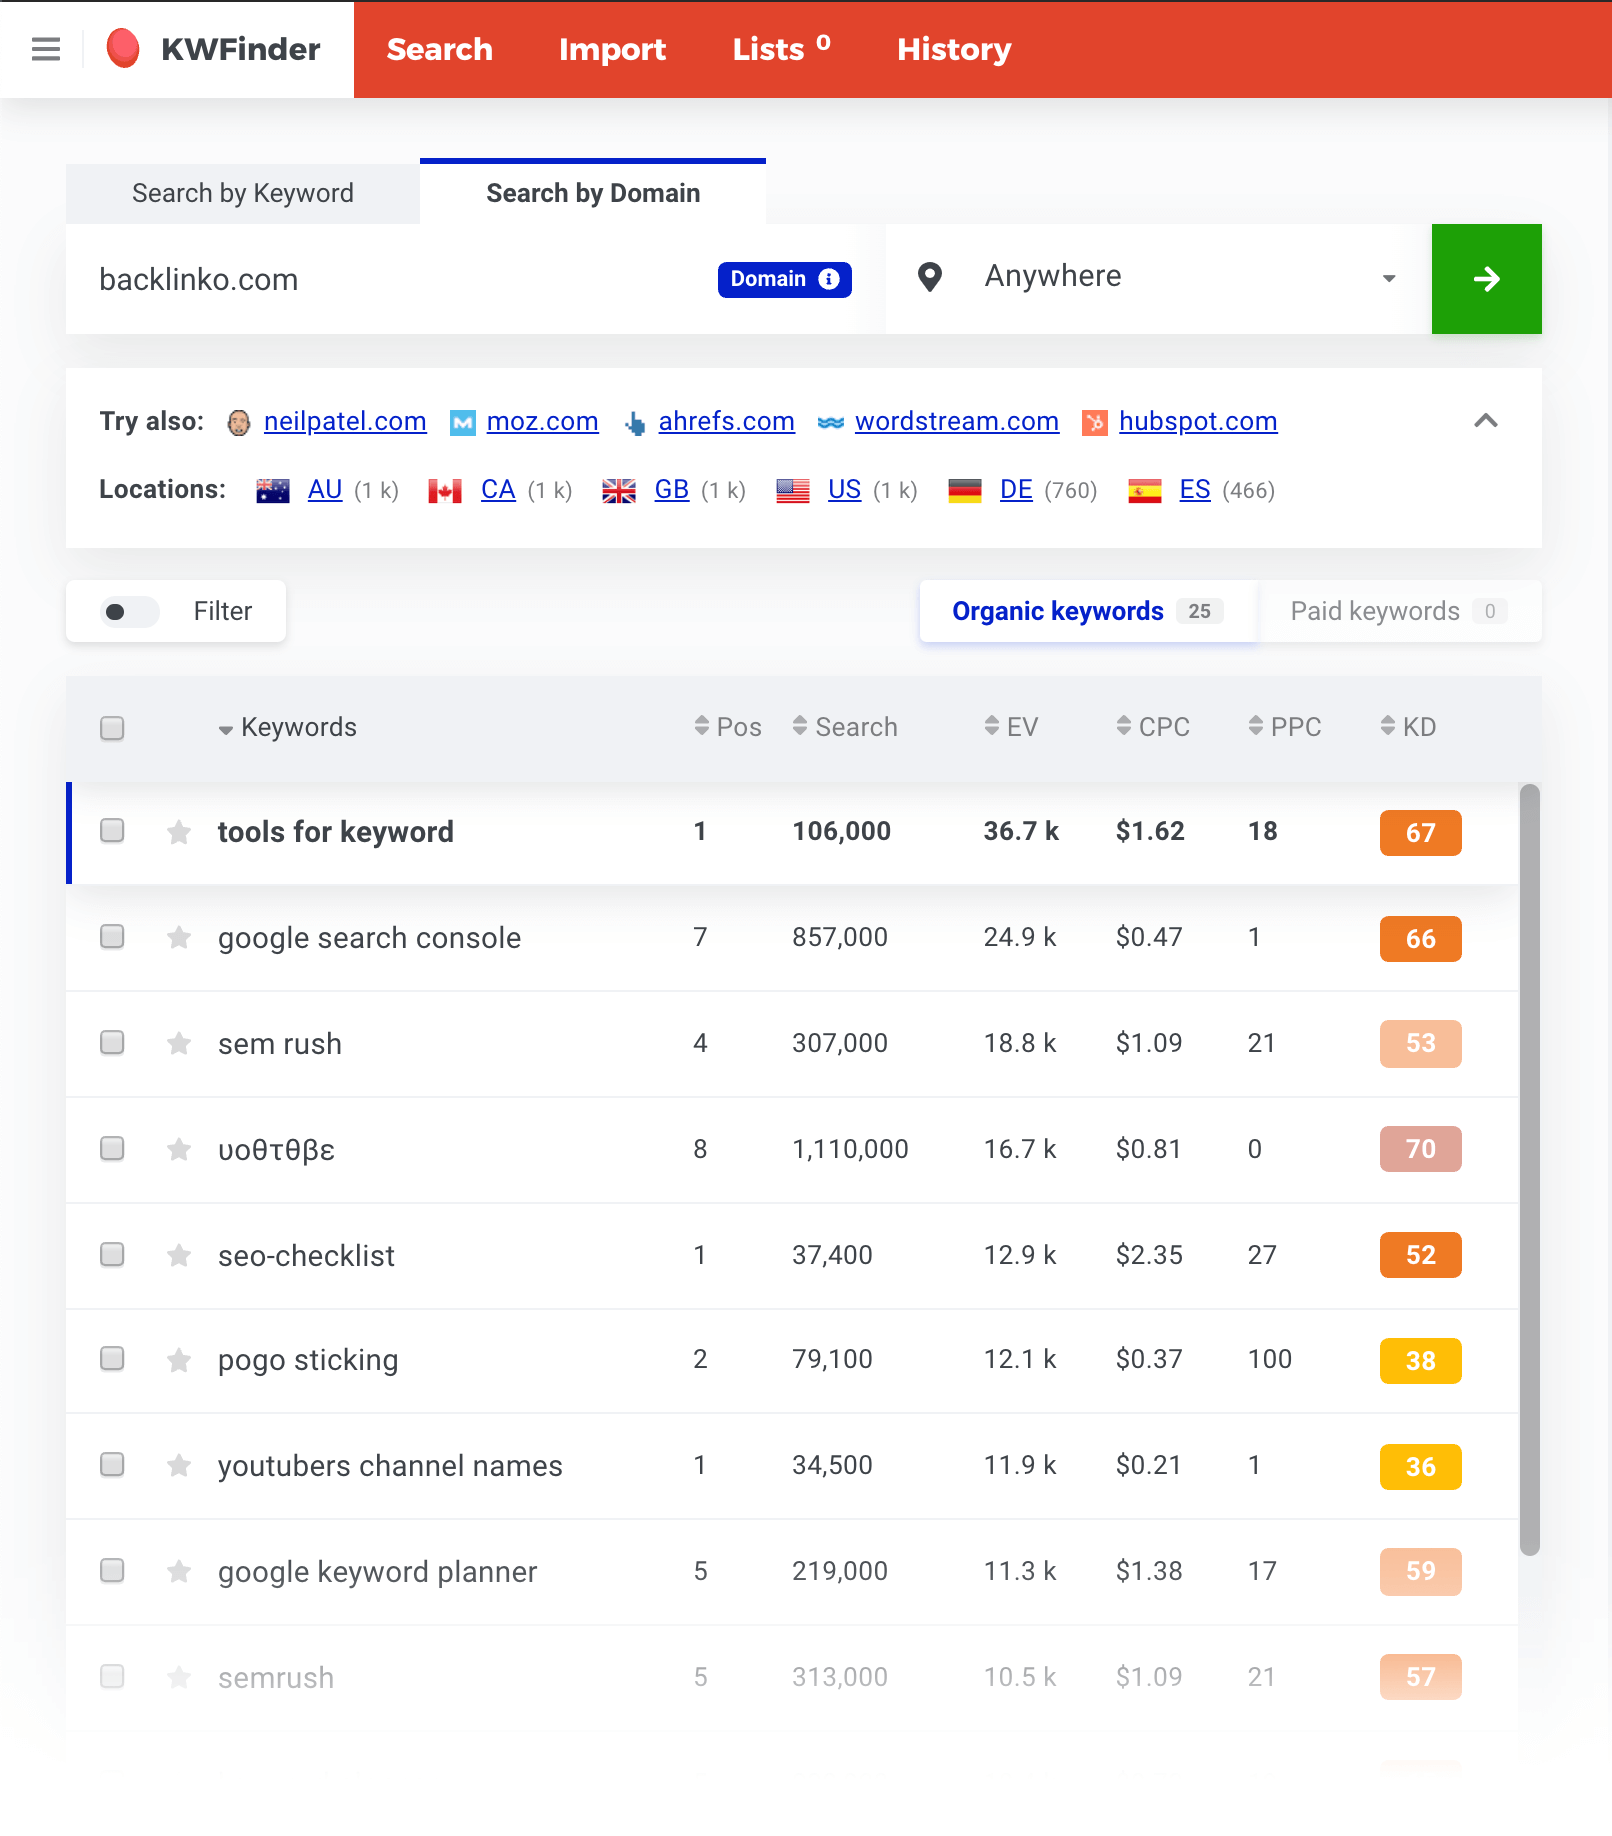 Kwfinder – Domain Results Backlinko